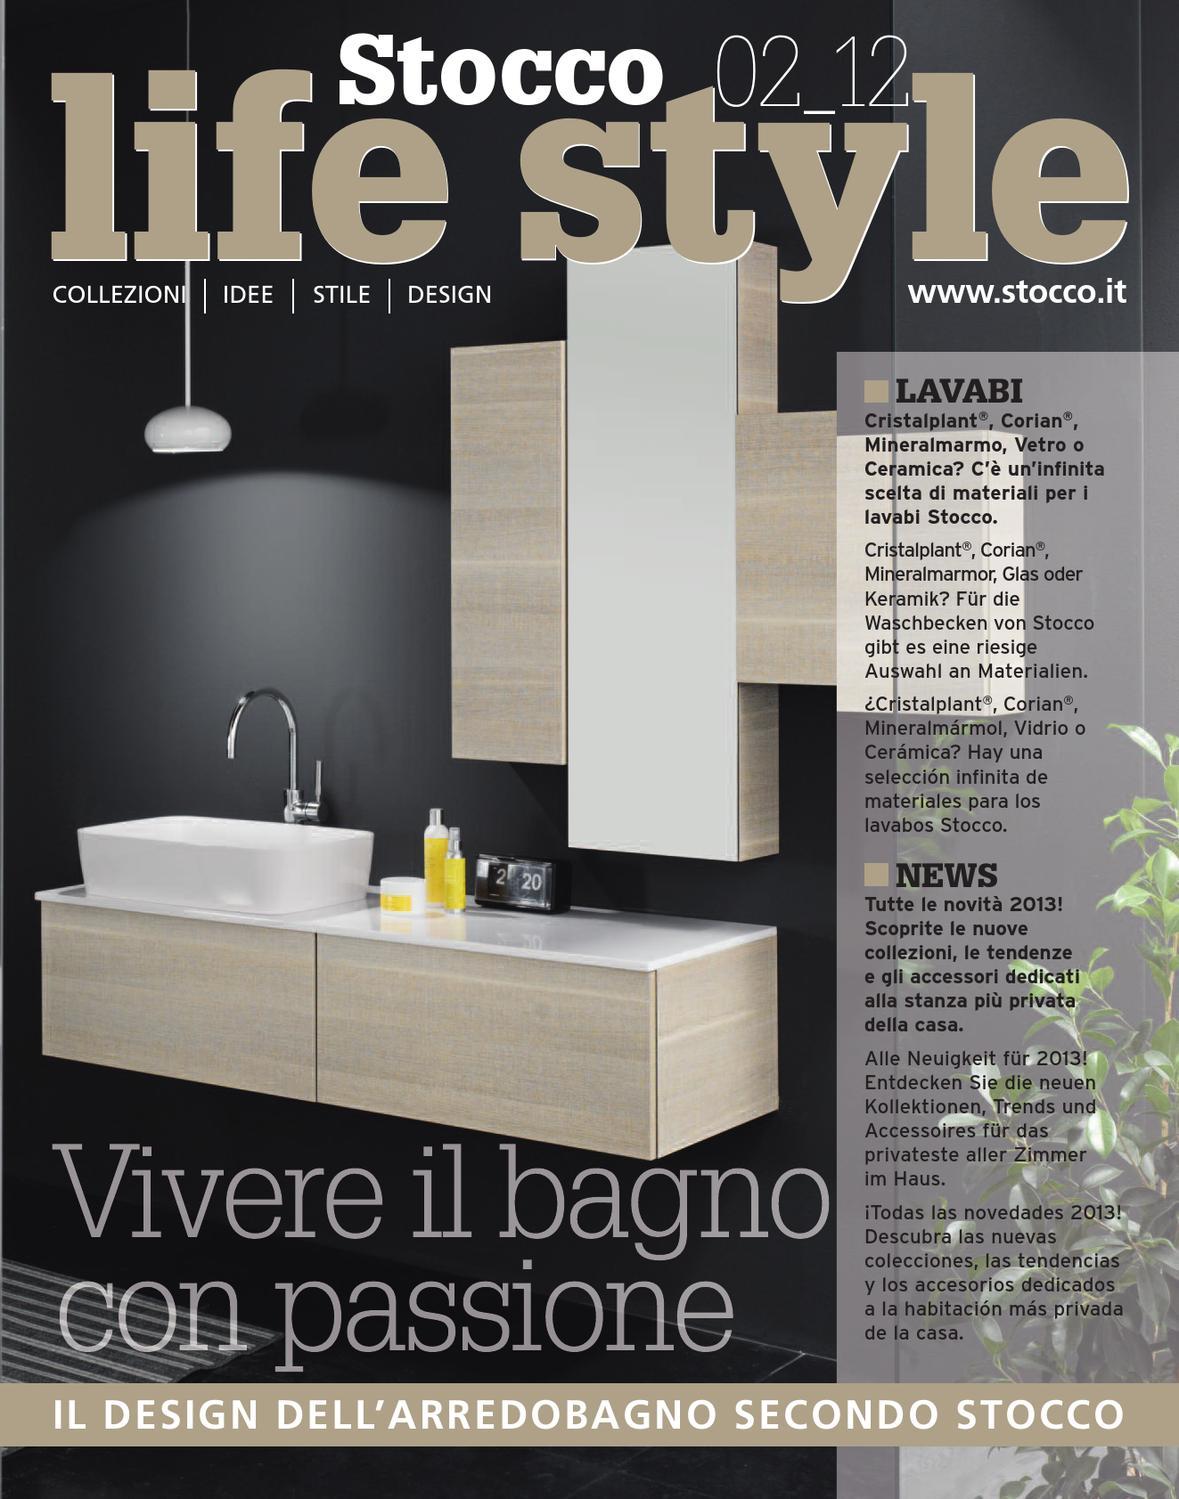 F Lli Stocco Arredo Bagno.Stocco Life Style 02 12 D By F Lli Stocco S R L Issuu